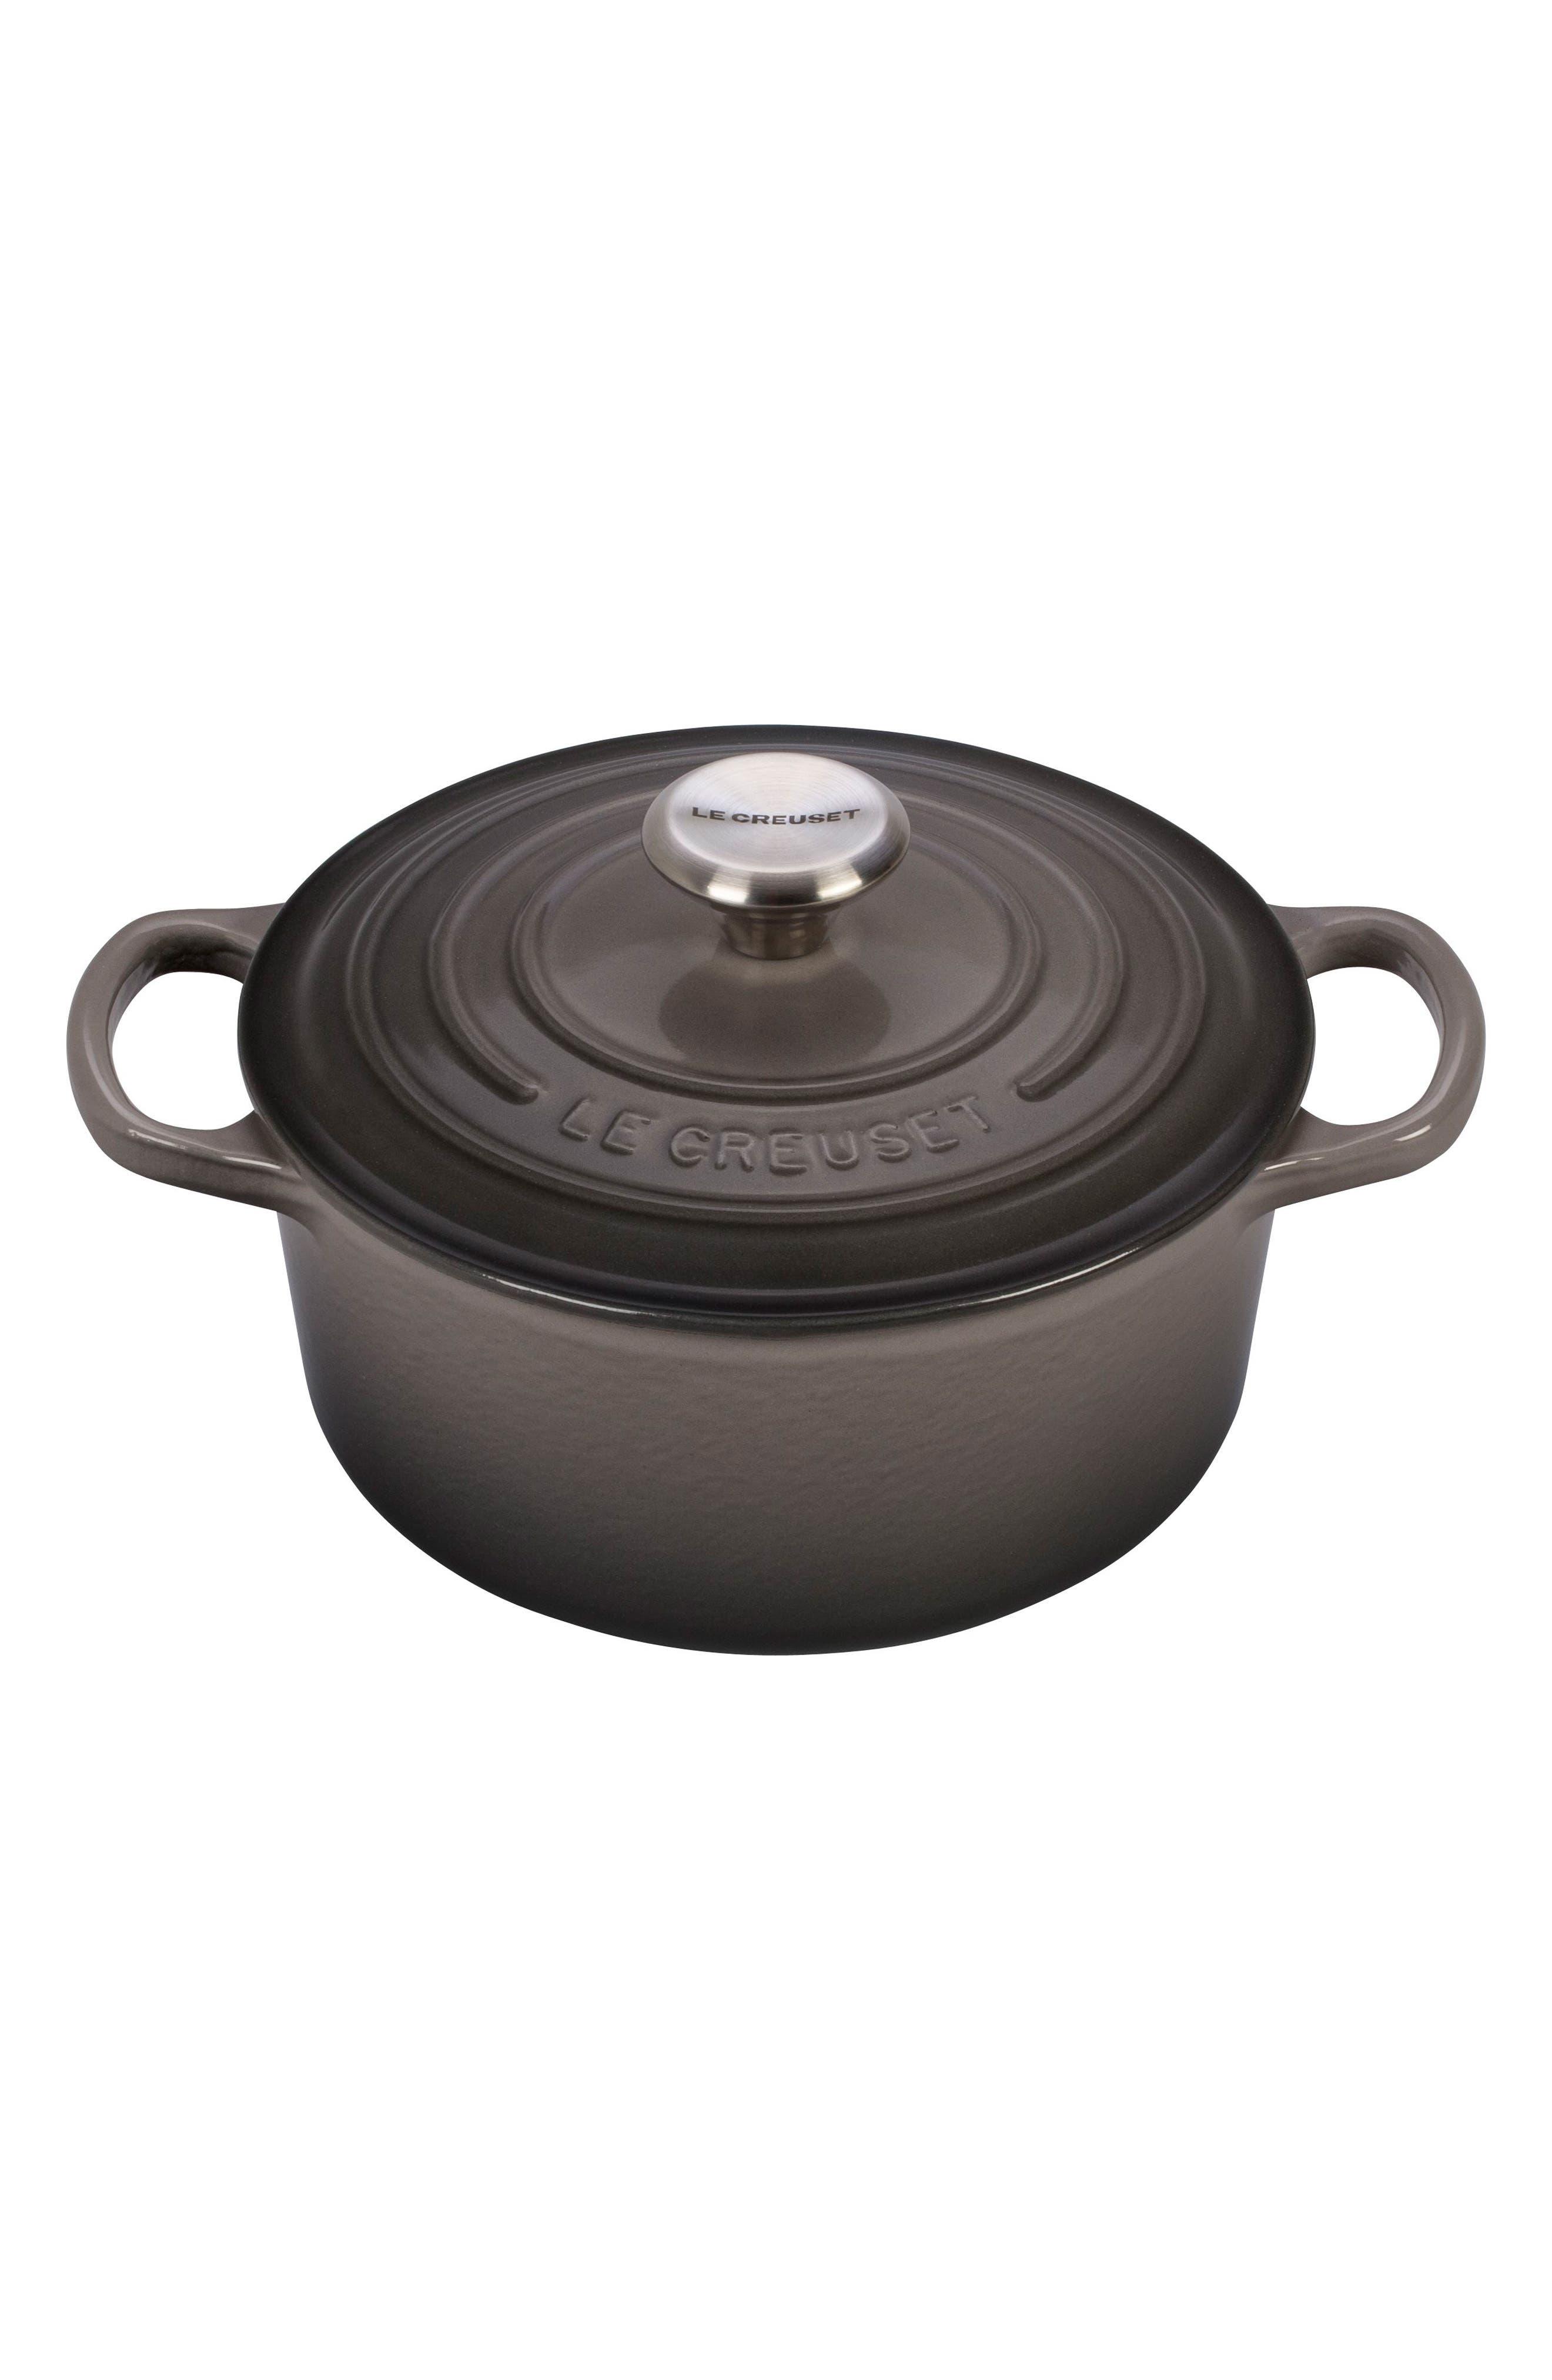 Signature 2-Quart Oval Enamel Cast Iron French/Dutch Oven,                         Main,                         color, 020